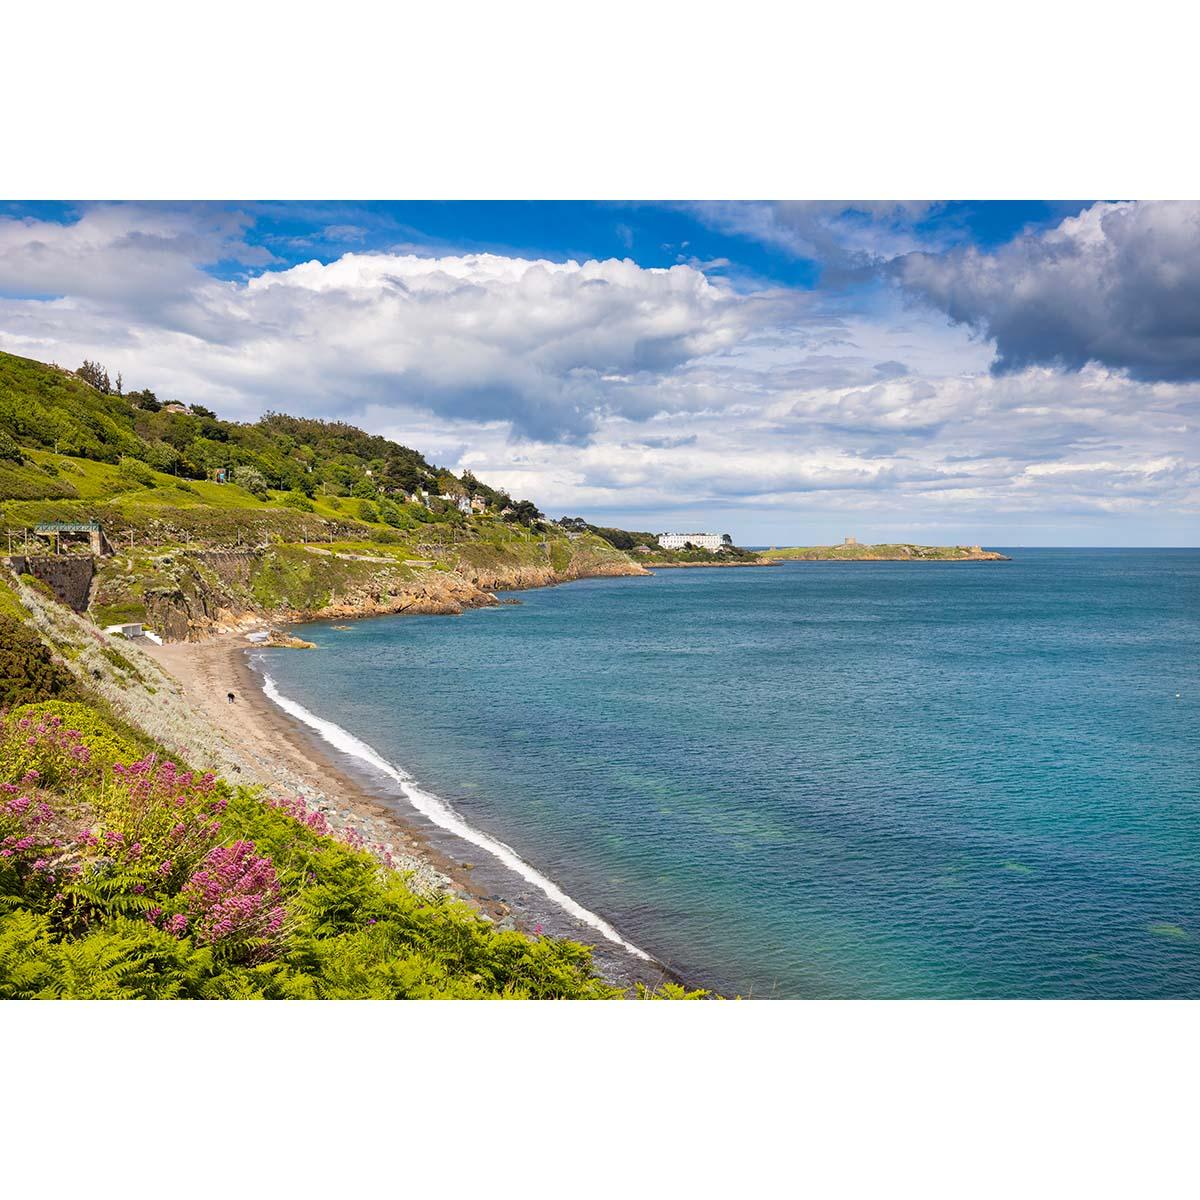 Whiterock Beach, Killiney © Robert Kelly